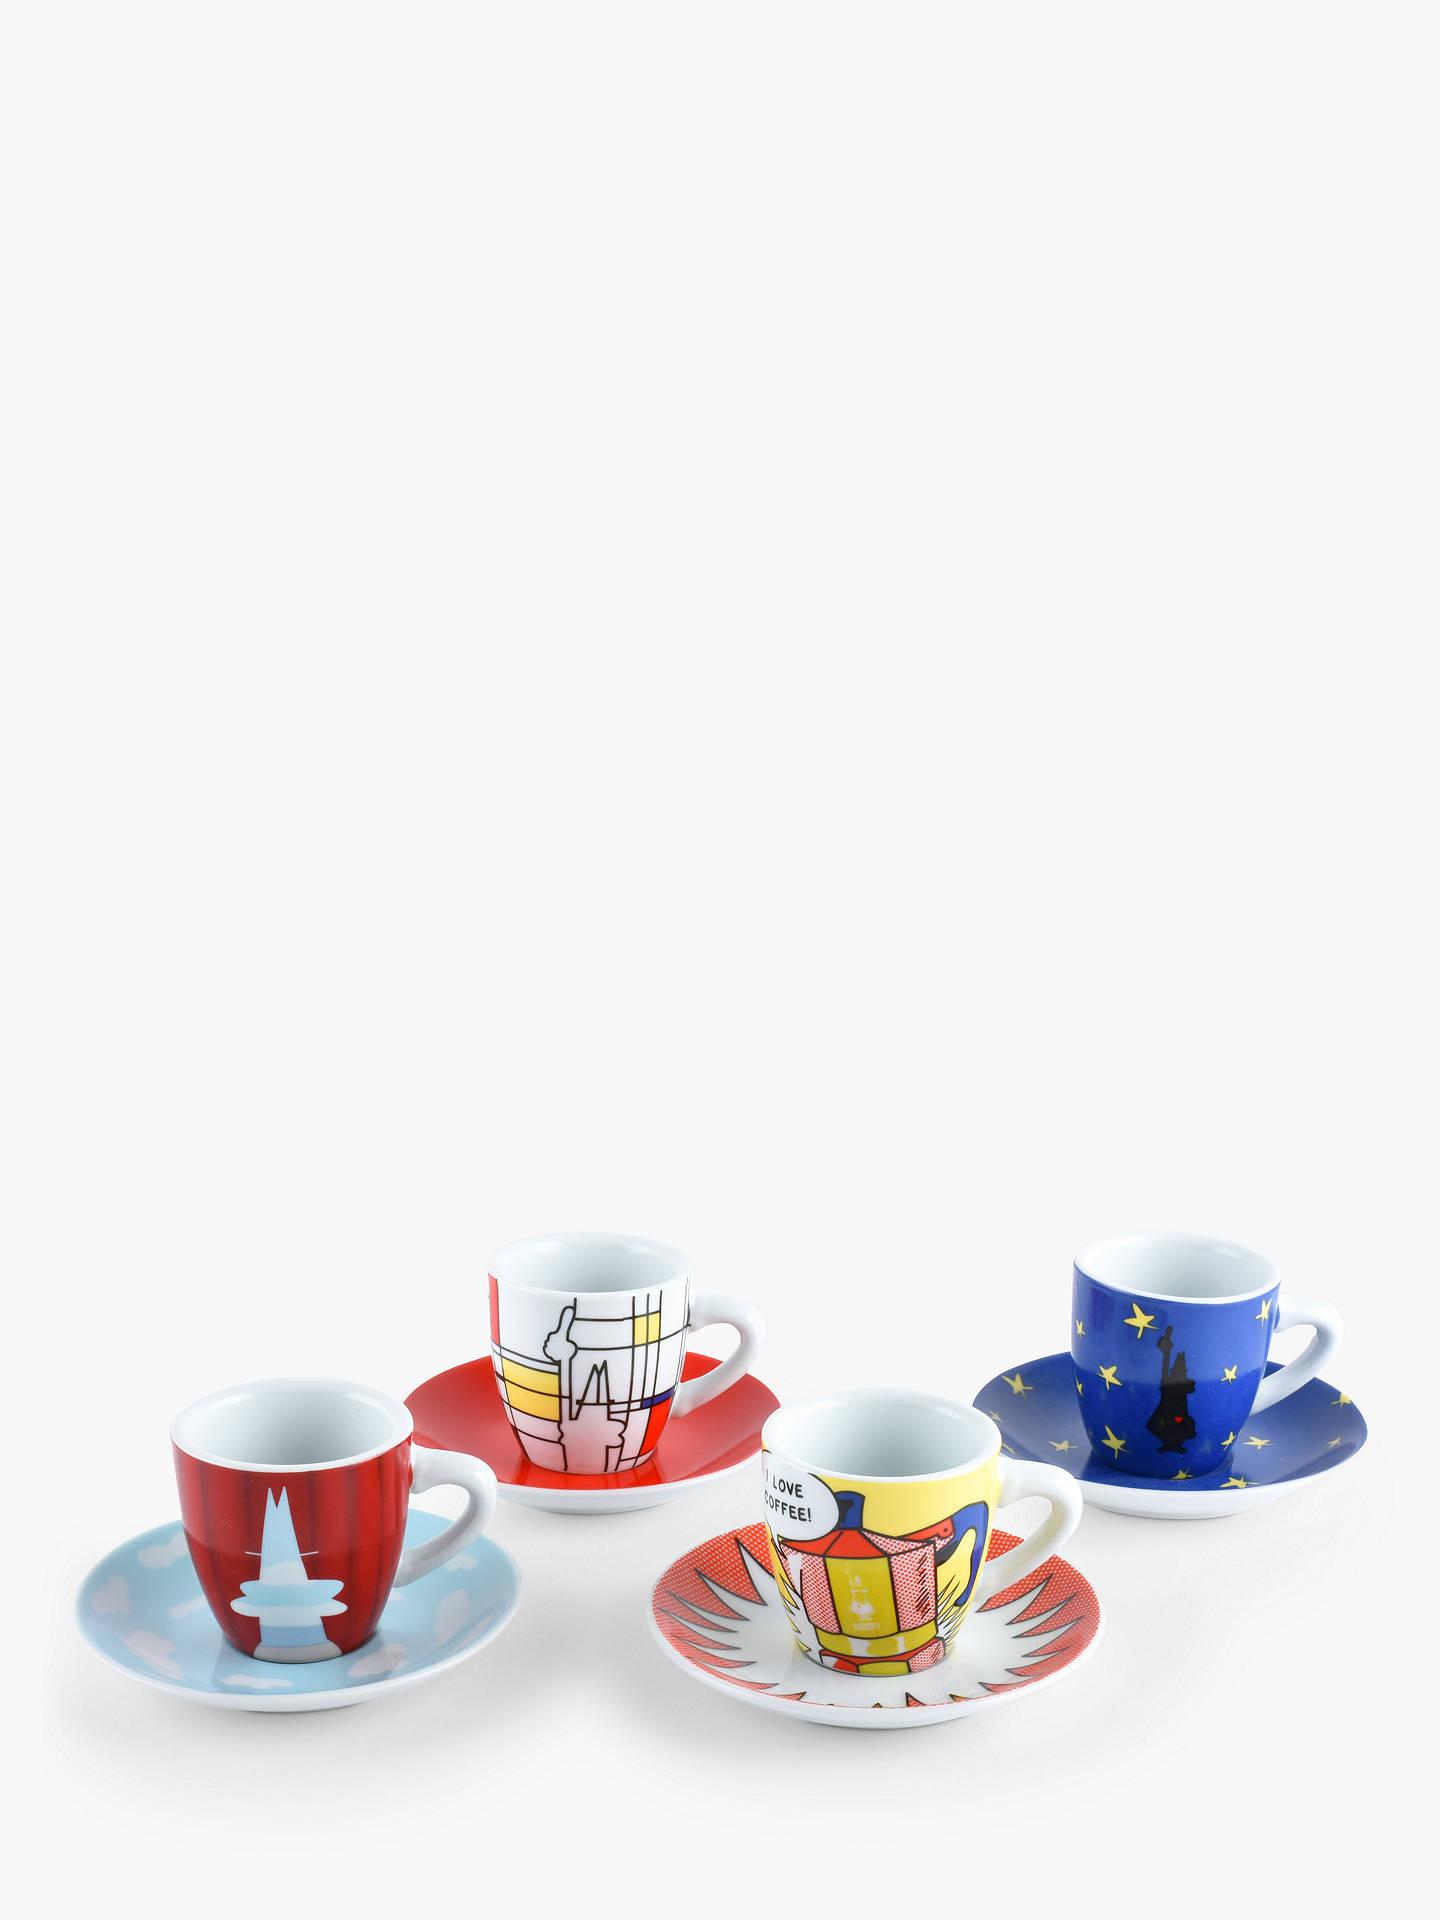 11 Best Espresso Cups to Buy in 2019 Unique Espresso Cups